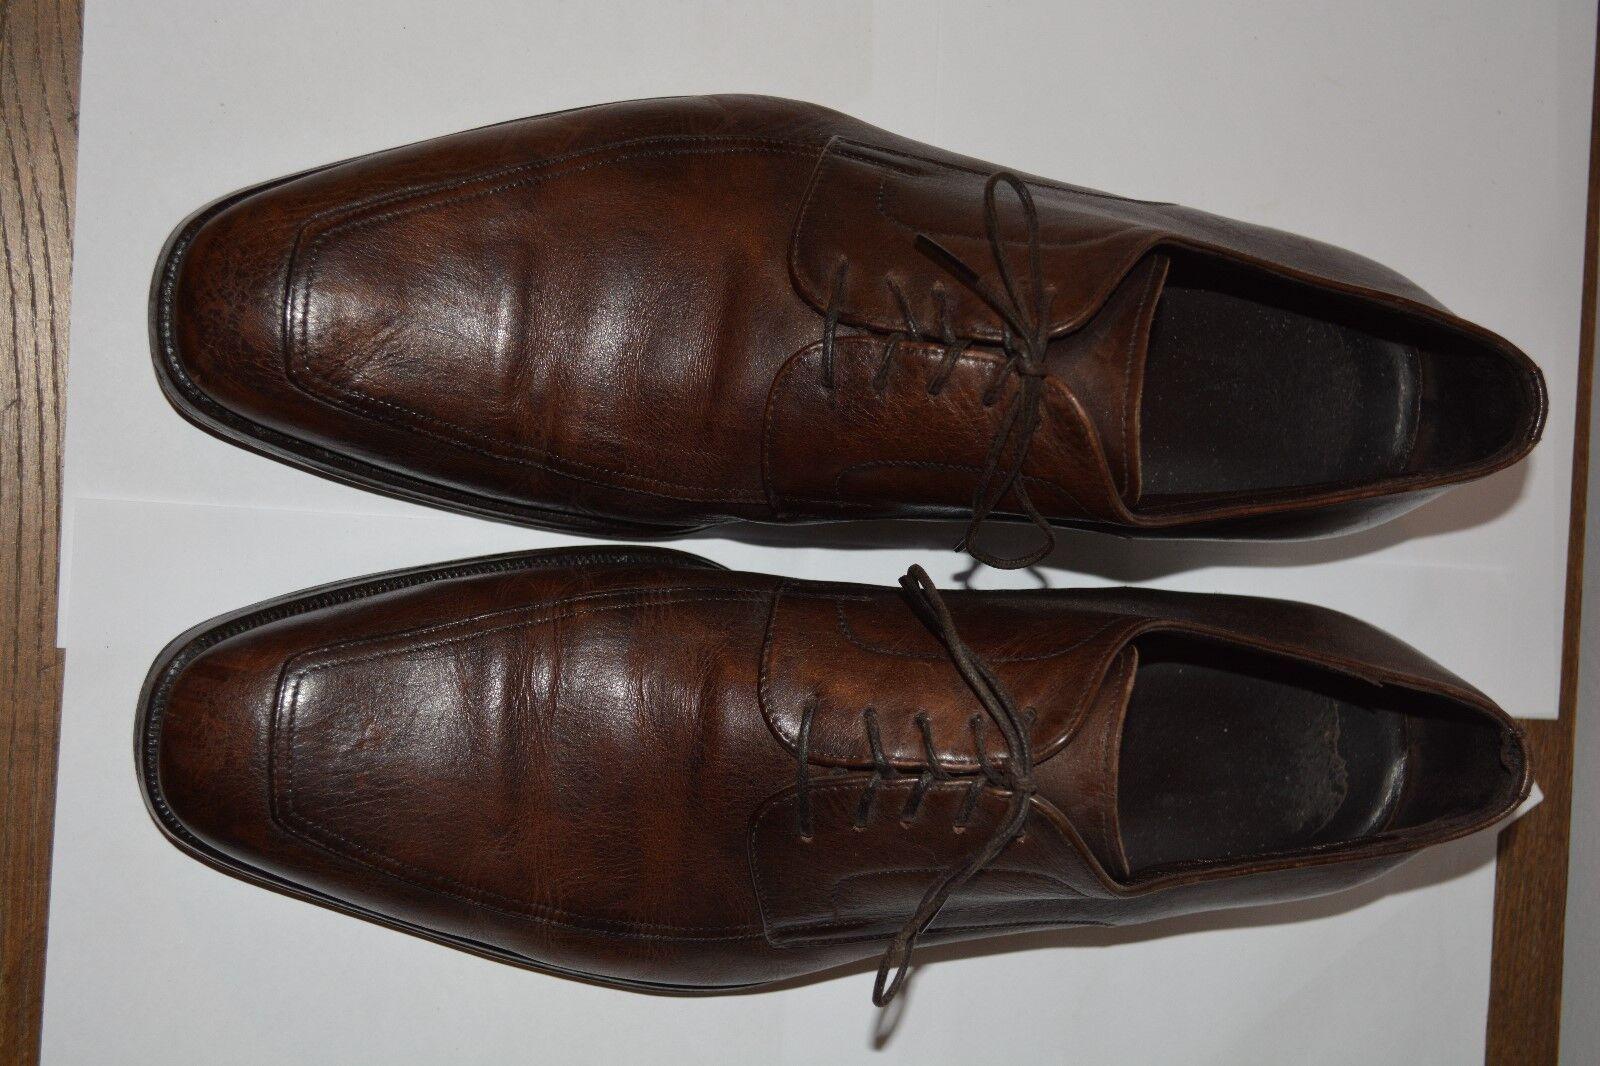 695 Ermenegildo Zegna Brown Pelle Derby Dress Shoes 12 D ITALY